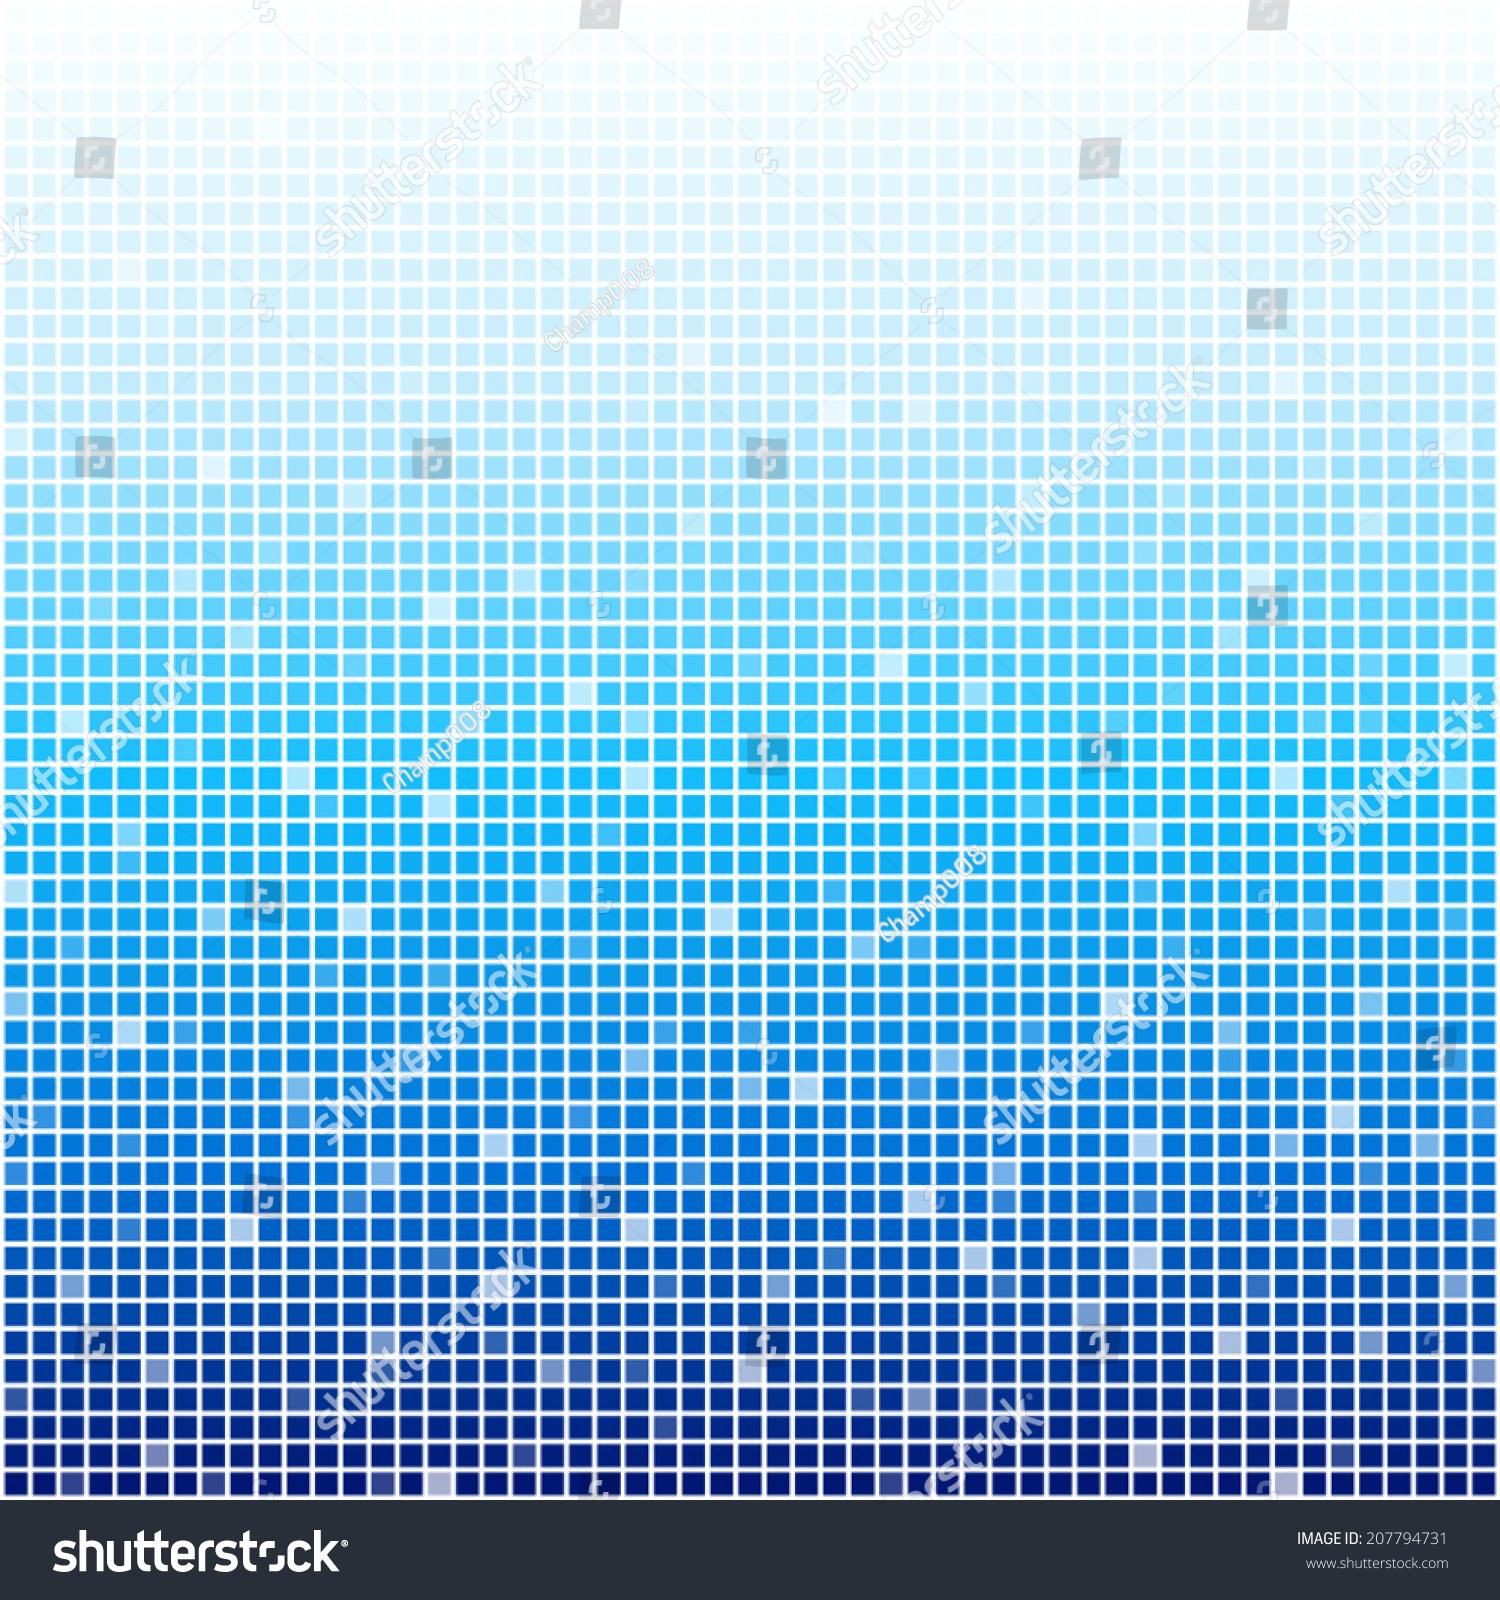 Blue square pattern background - photo#16